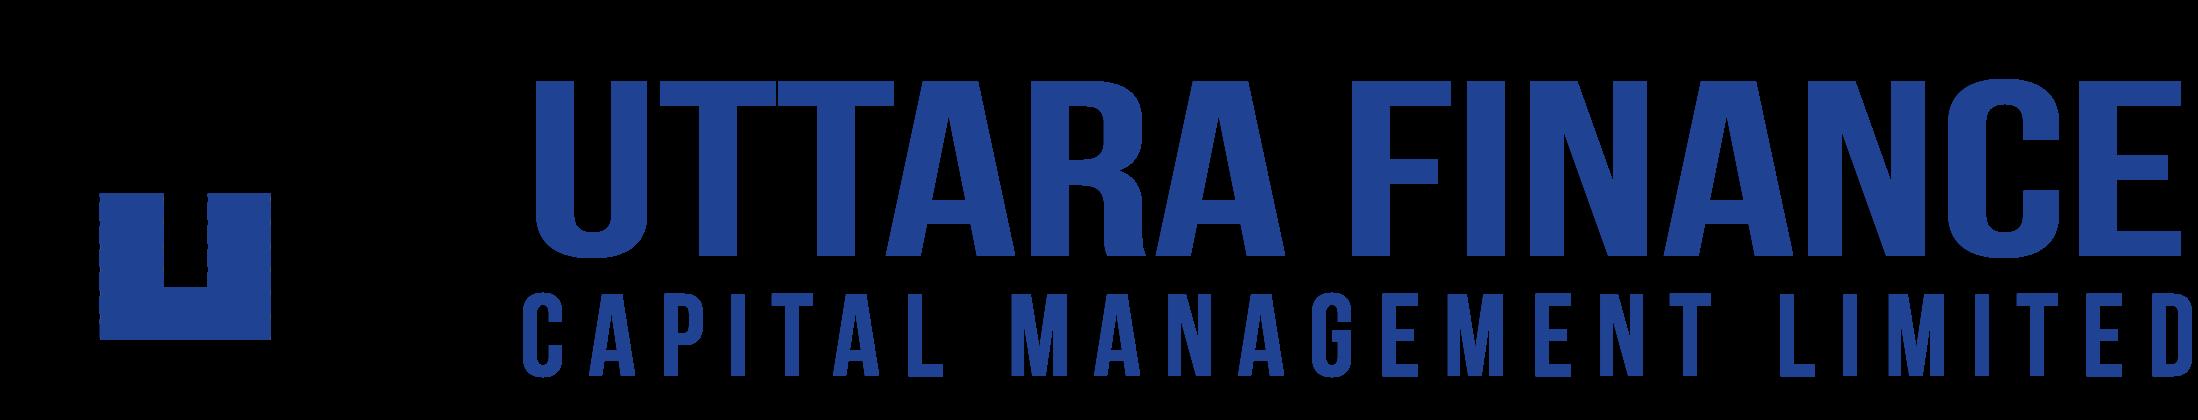 Uttara Finance Capital Management Limited